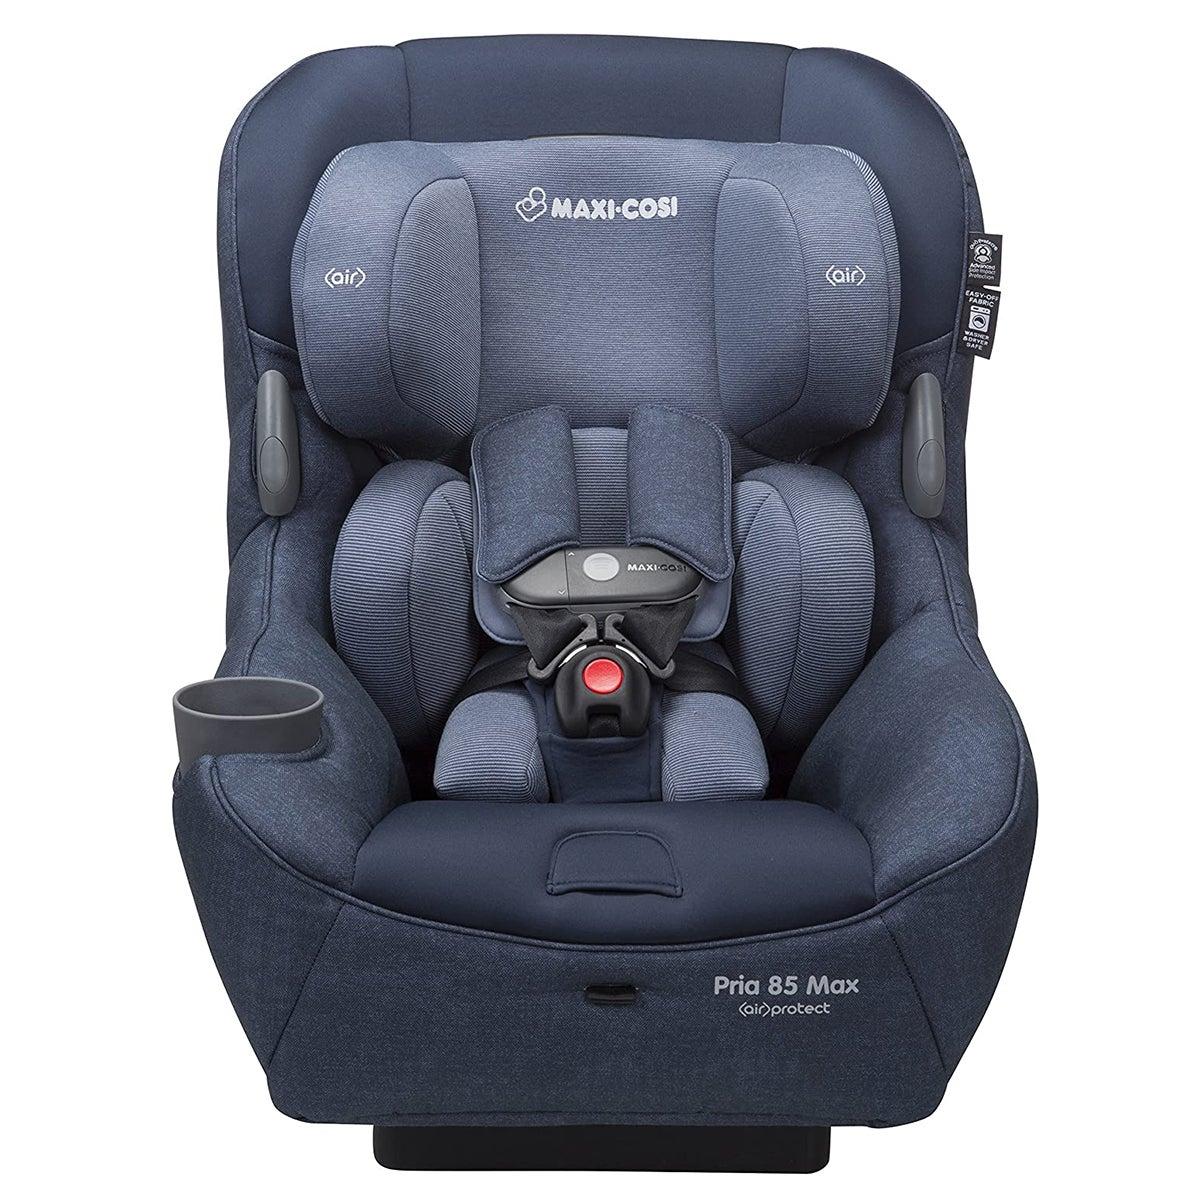 Maxi Cosi Pro 85 Max Convertible Car Seat